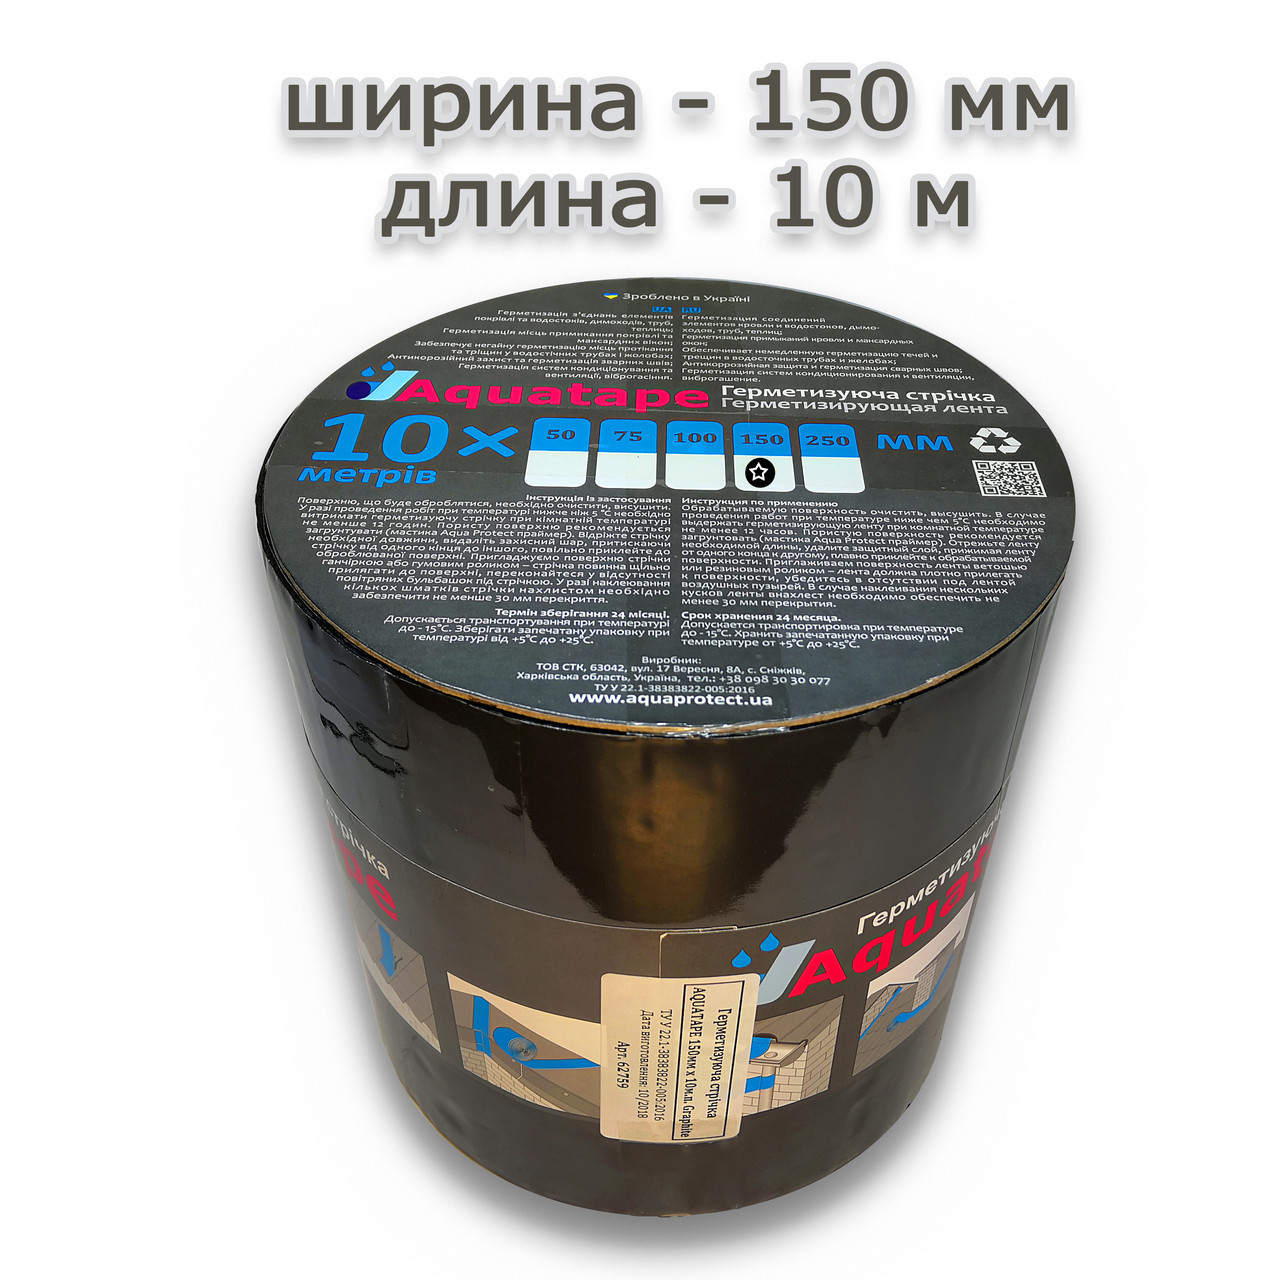 Битумная Лента 150 мм х 10 м ALU+Graphite RAL 7012